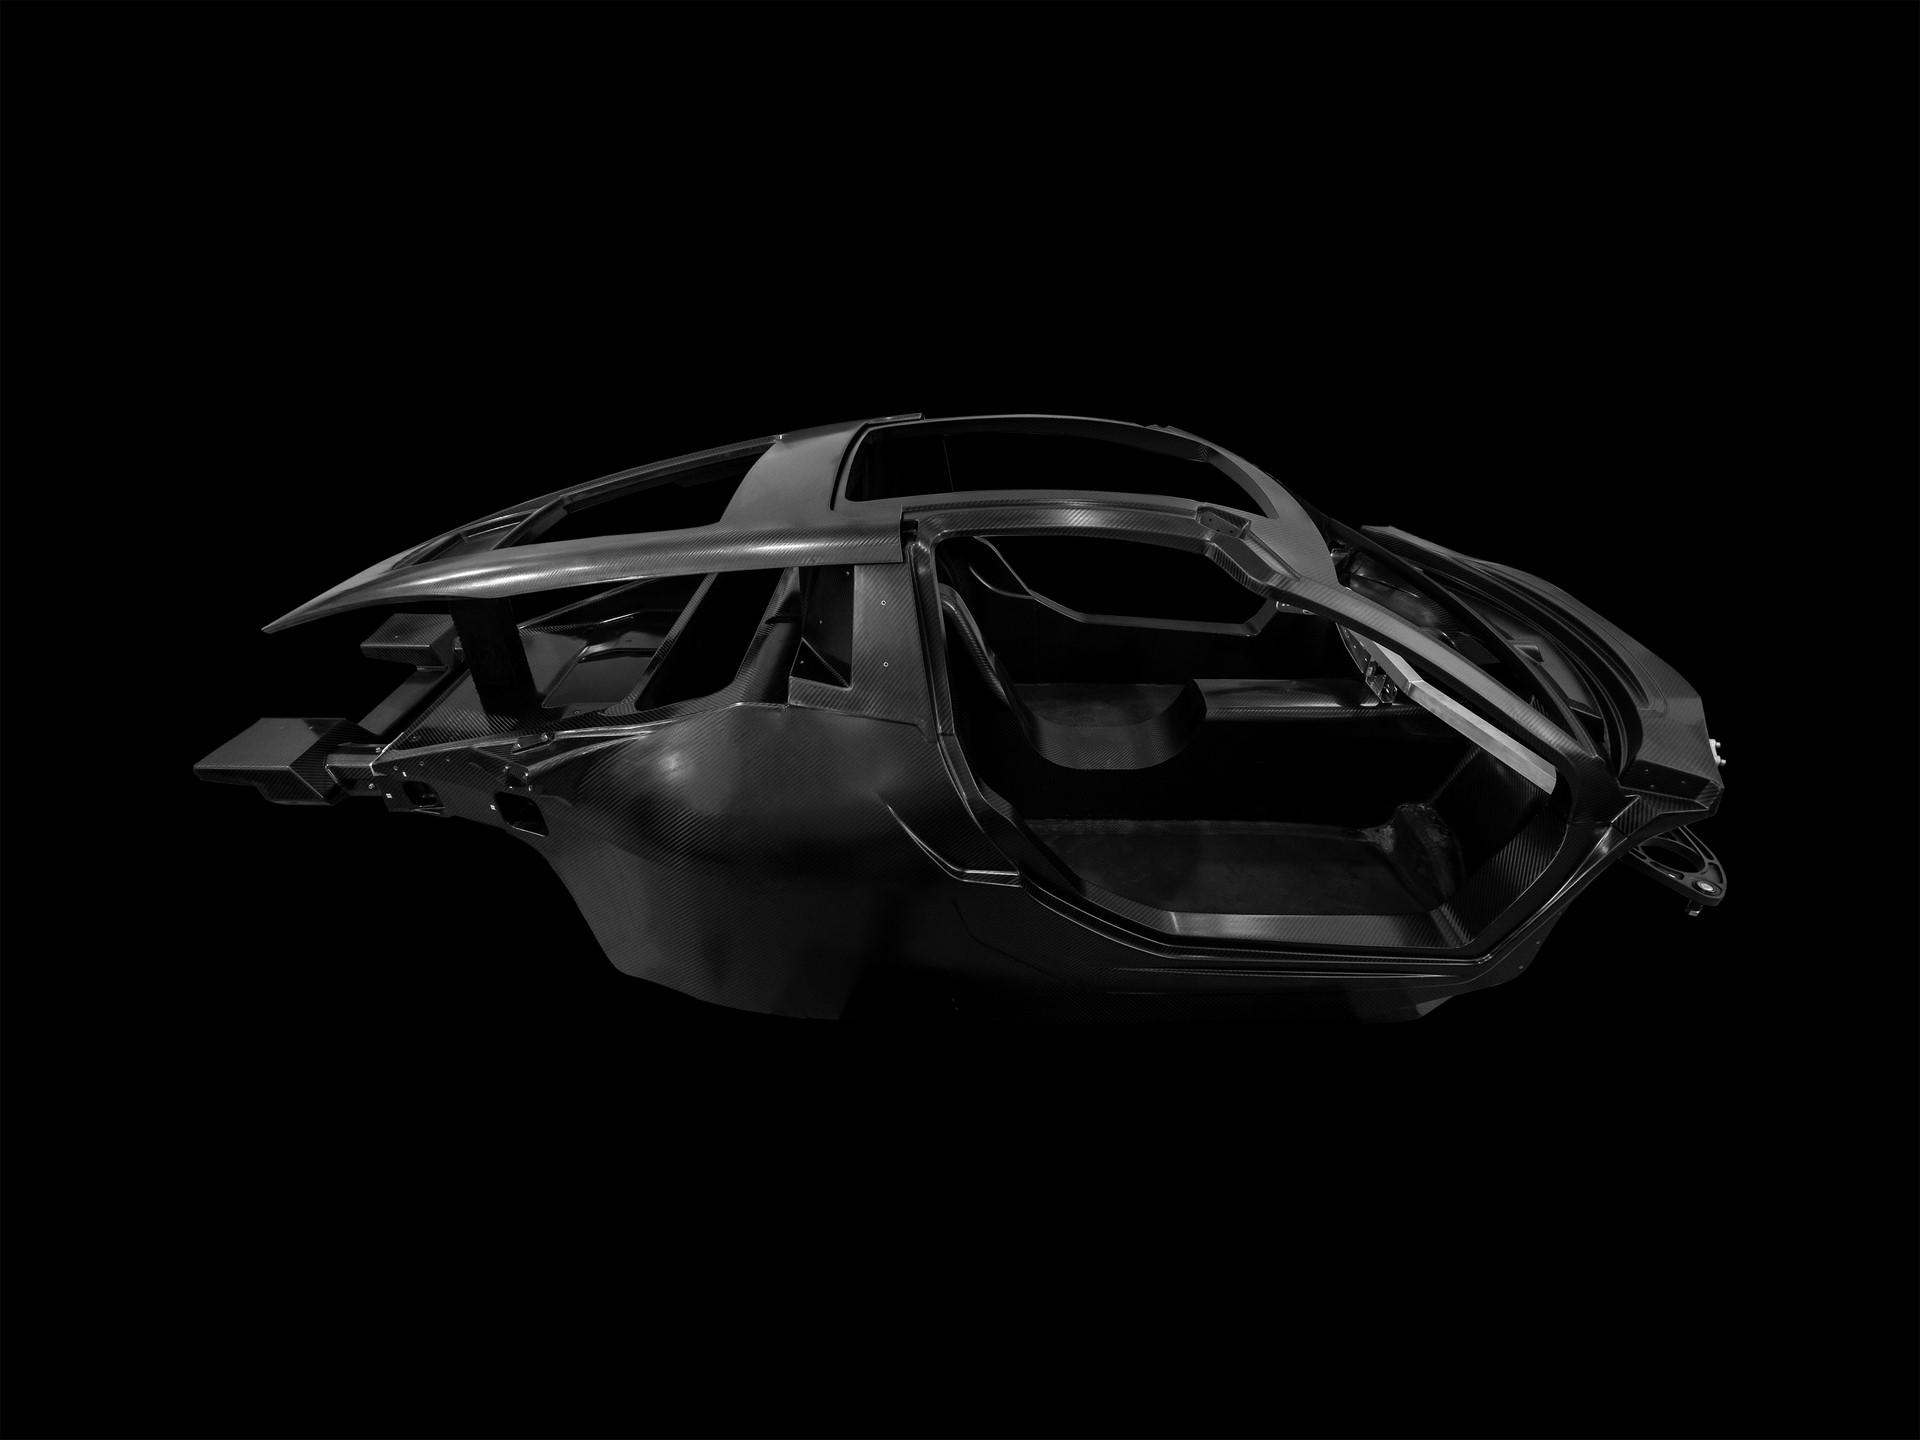 Hispano-Suiza-Carmen-carbon-fibre-monocoque